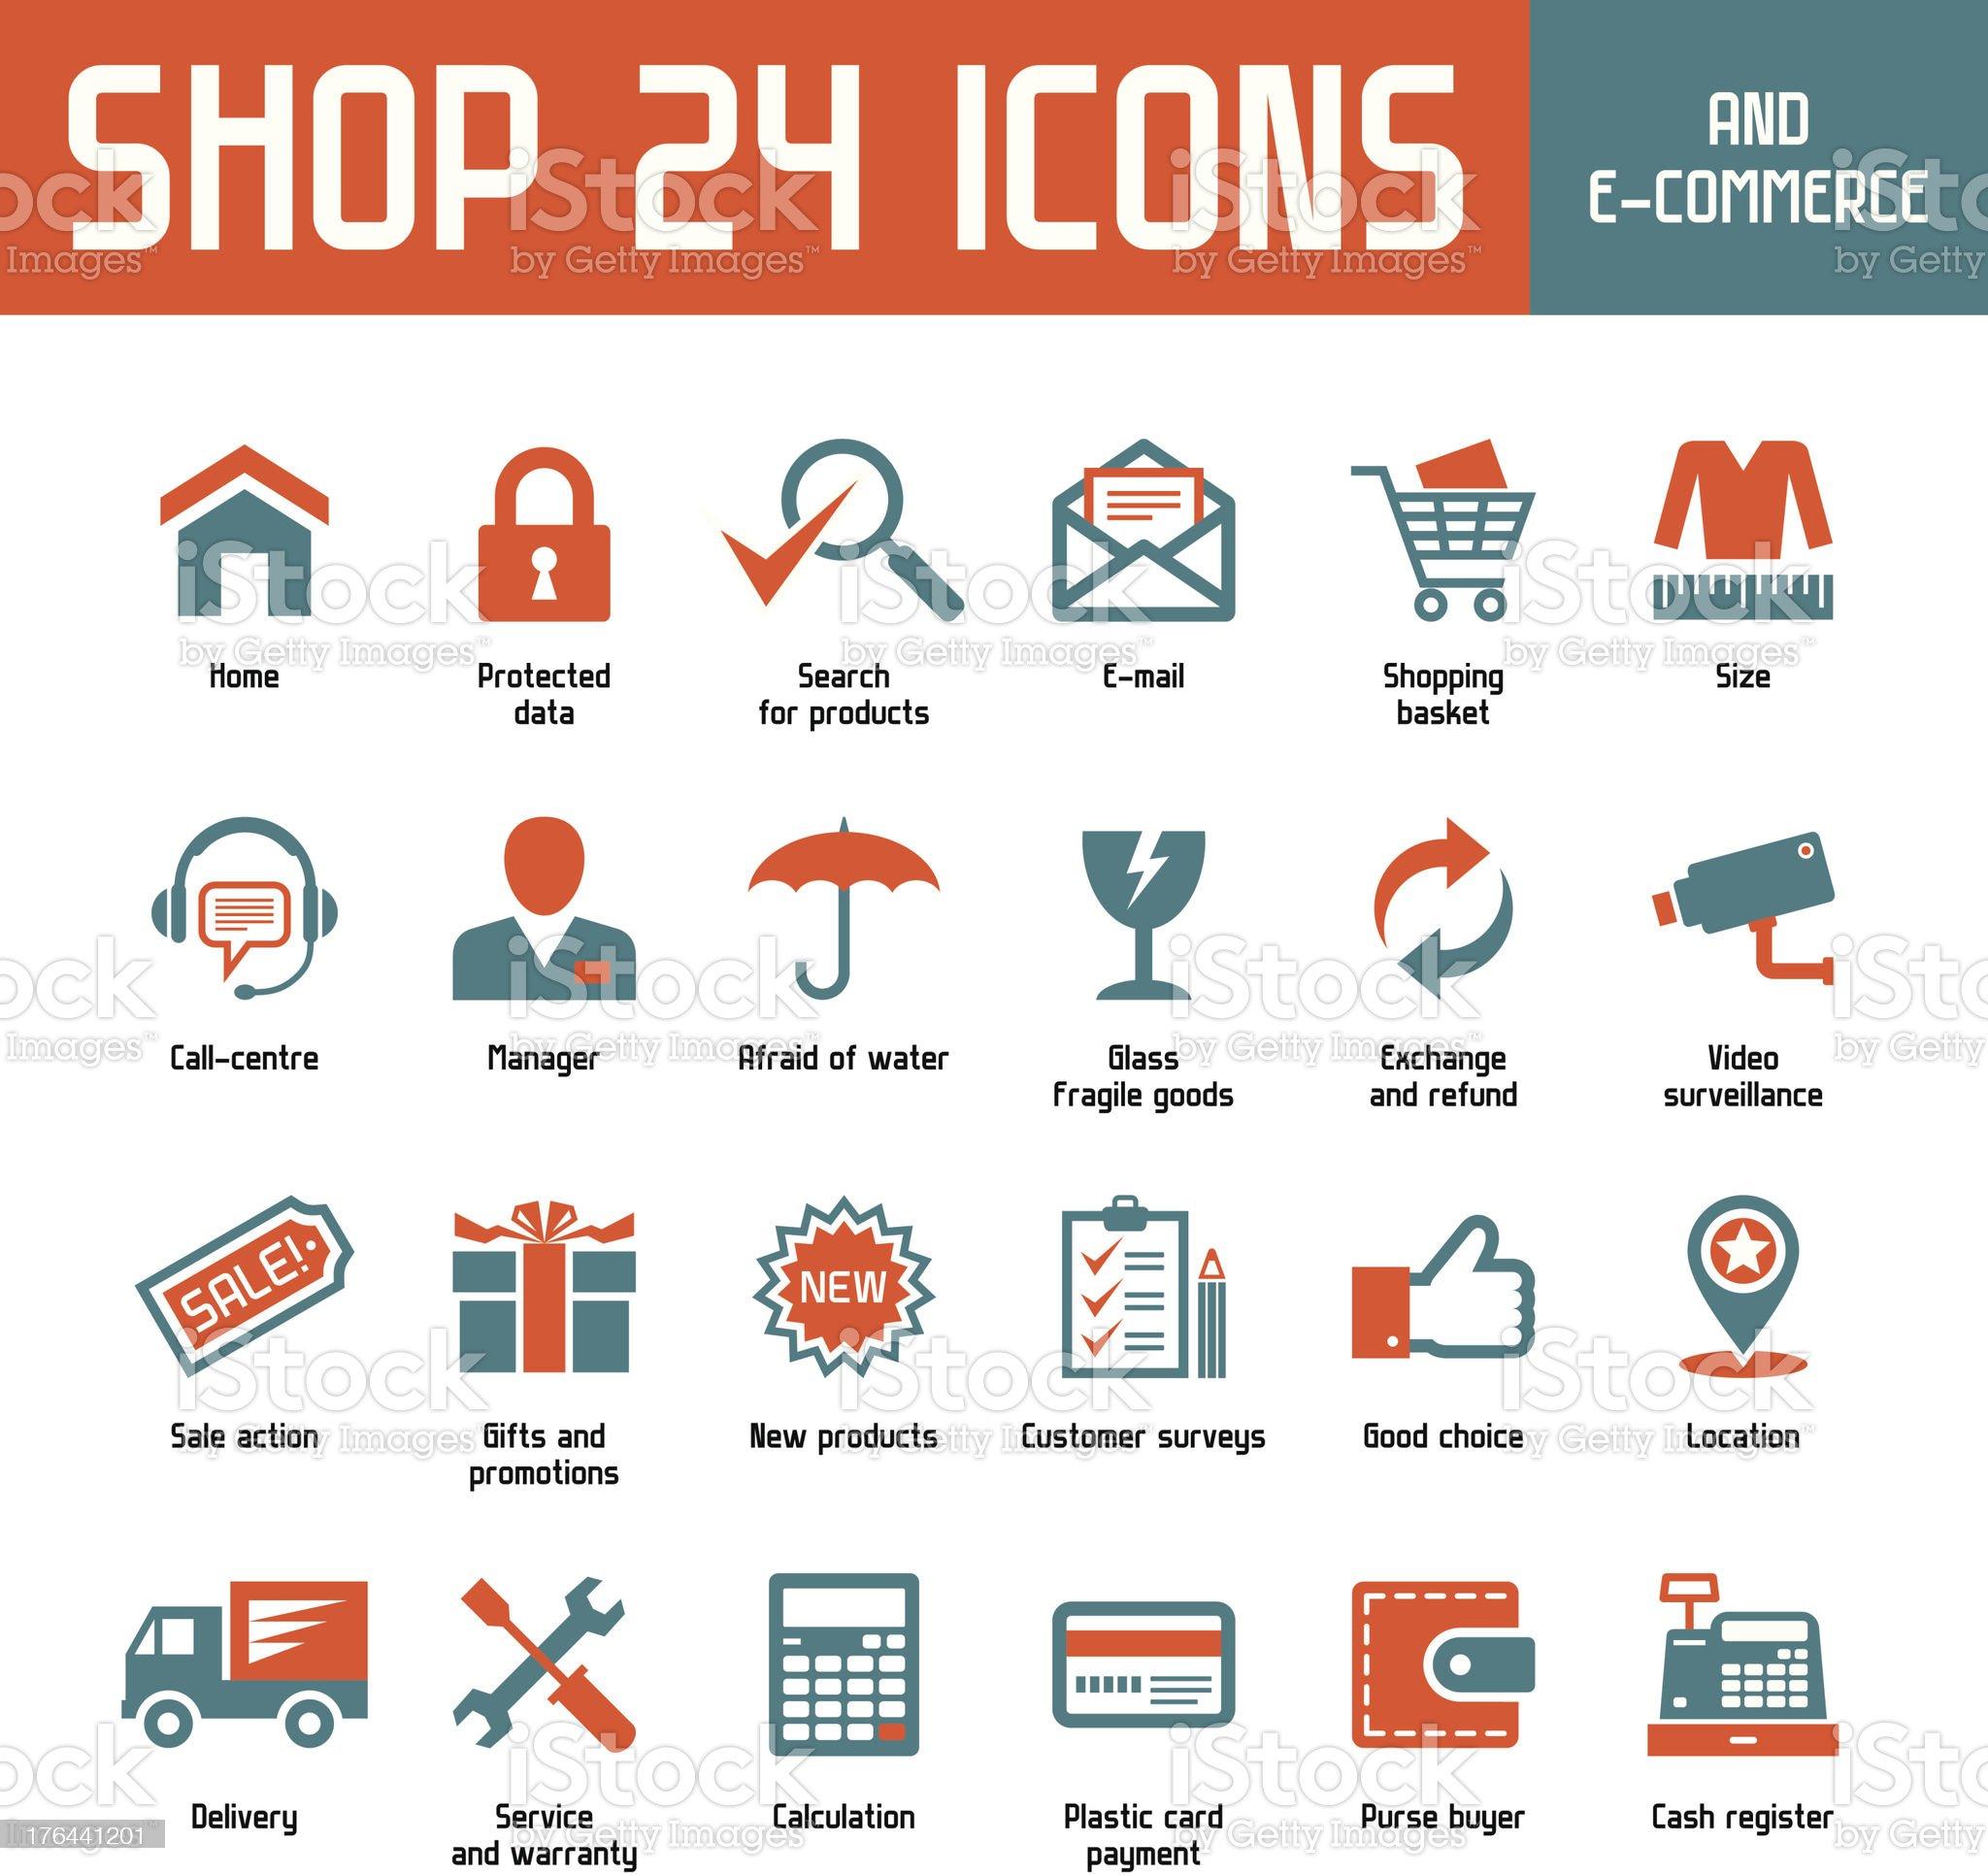 Shop 24 Vector Icons royalty-free stock vector art